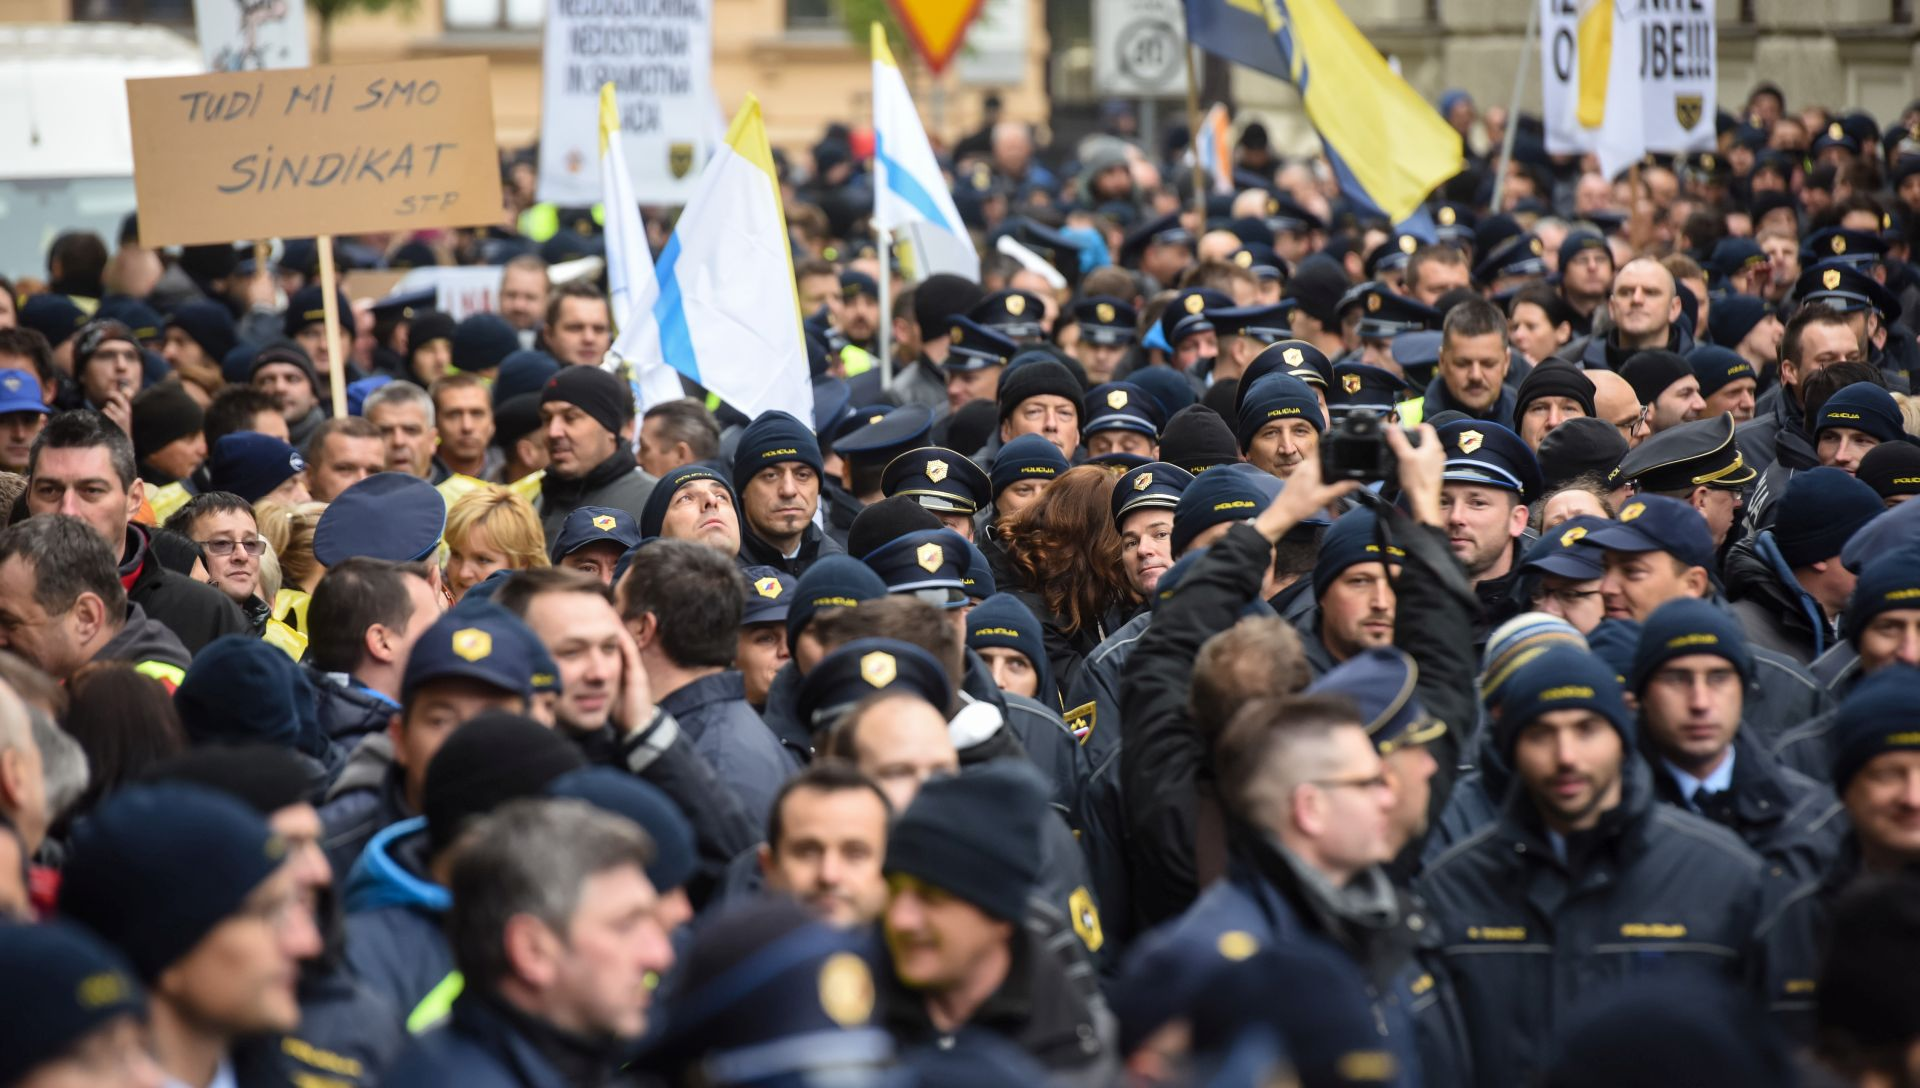 Više od tisuću policajaca prosvjedovalo pred zgradom slovenske vlade